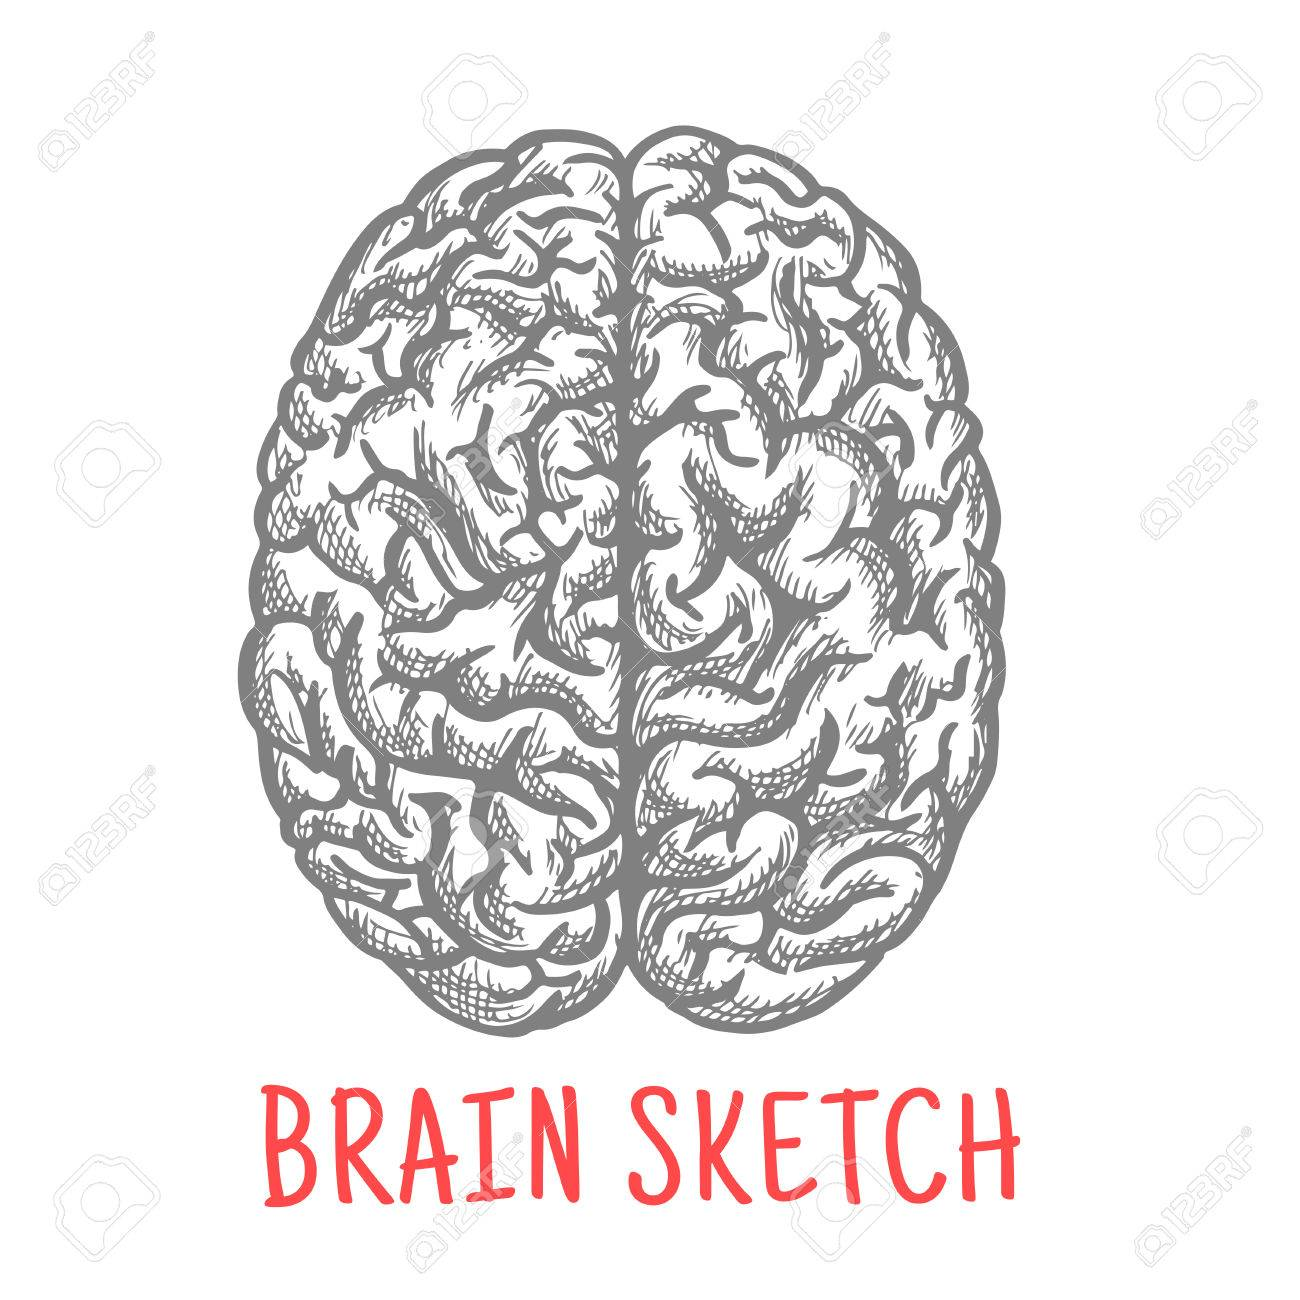 Sketch Of Human Brain For Medicine Anatomy Or Creative Thinking